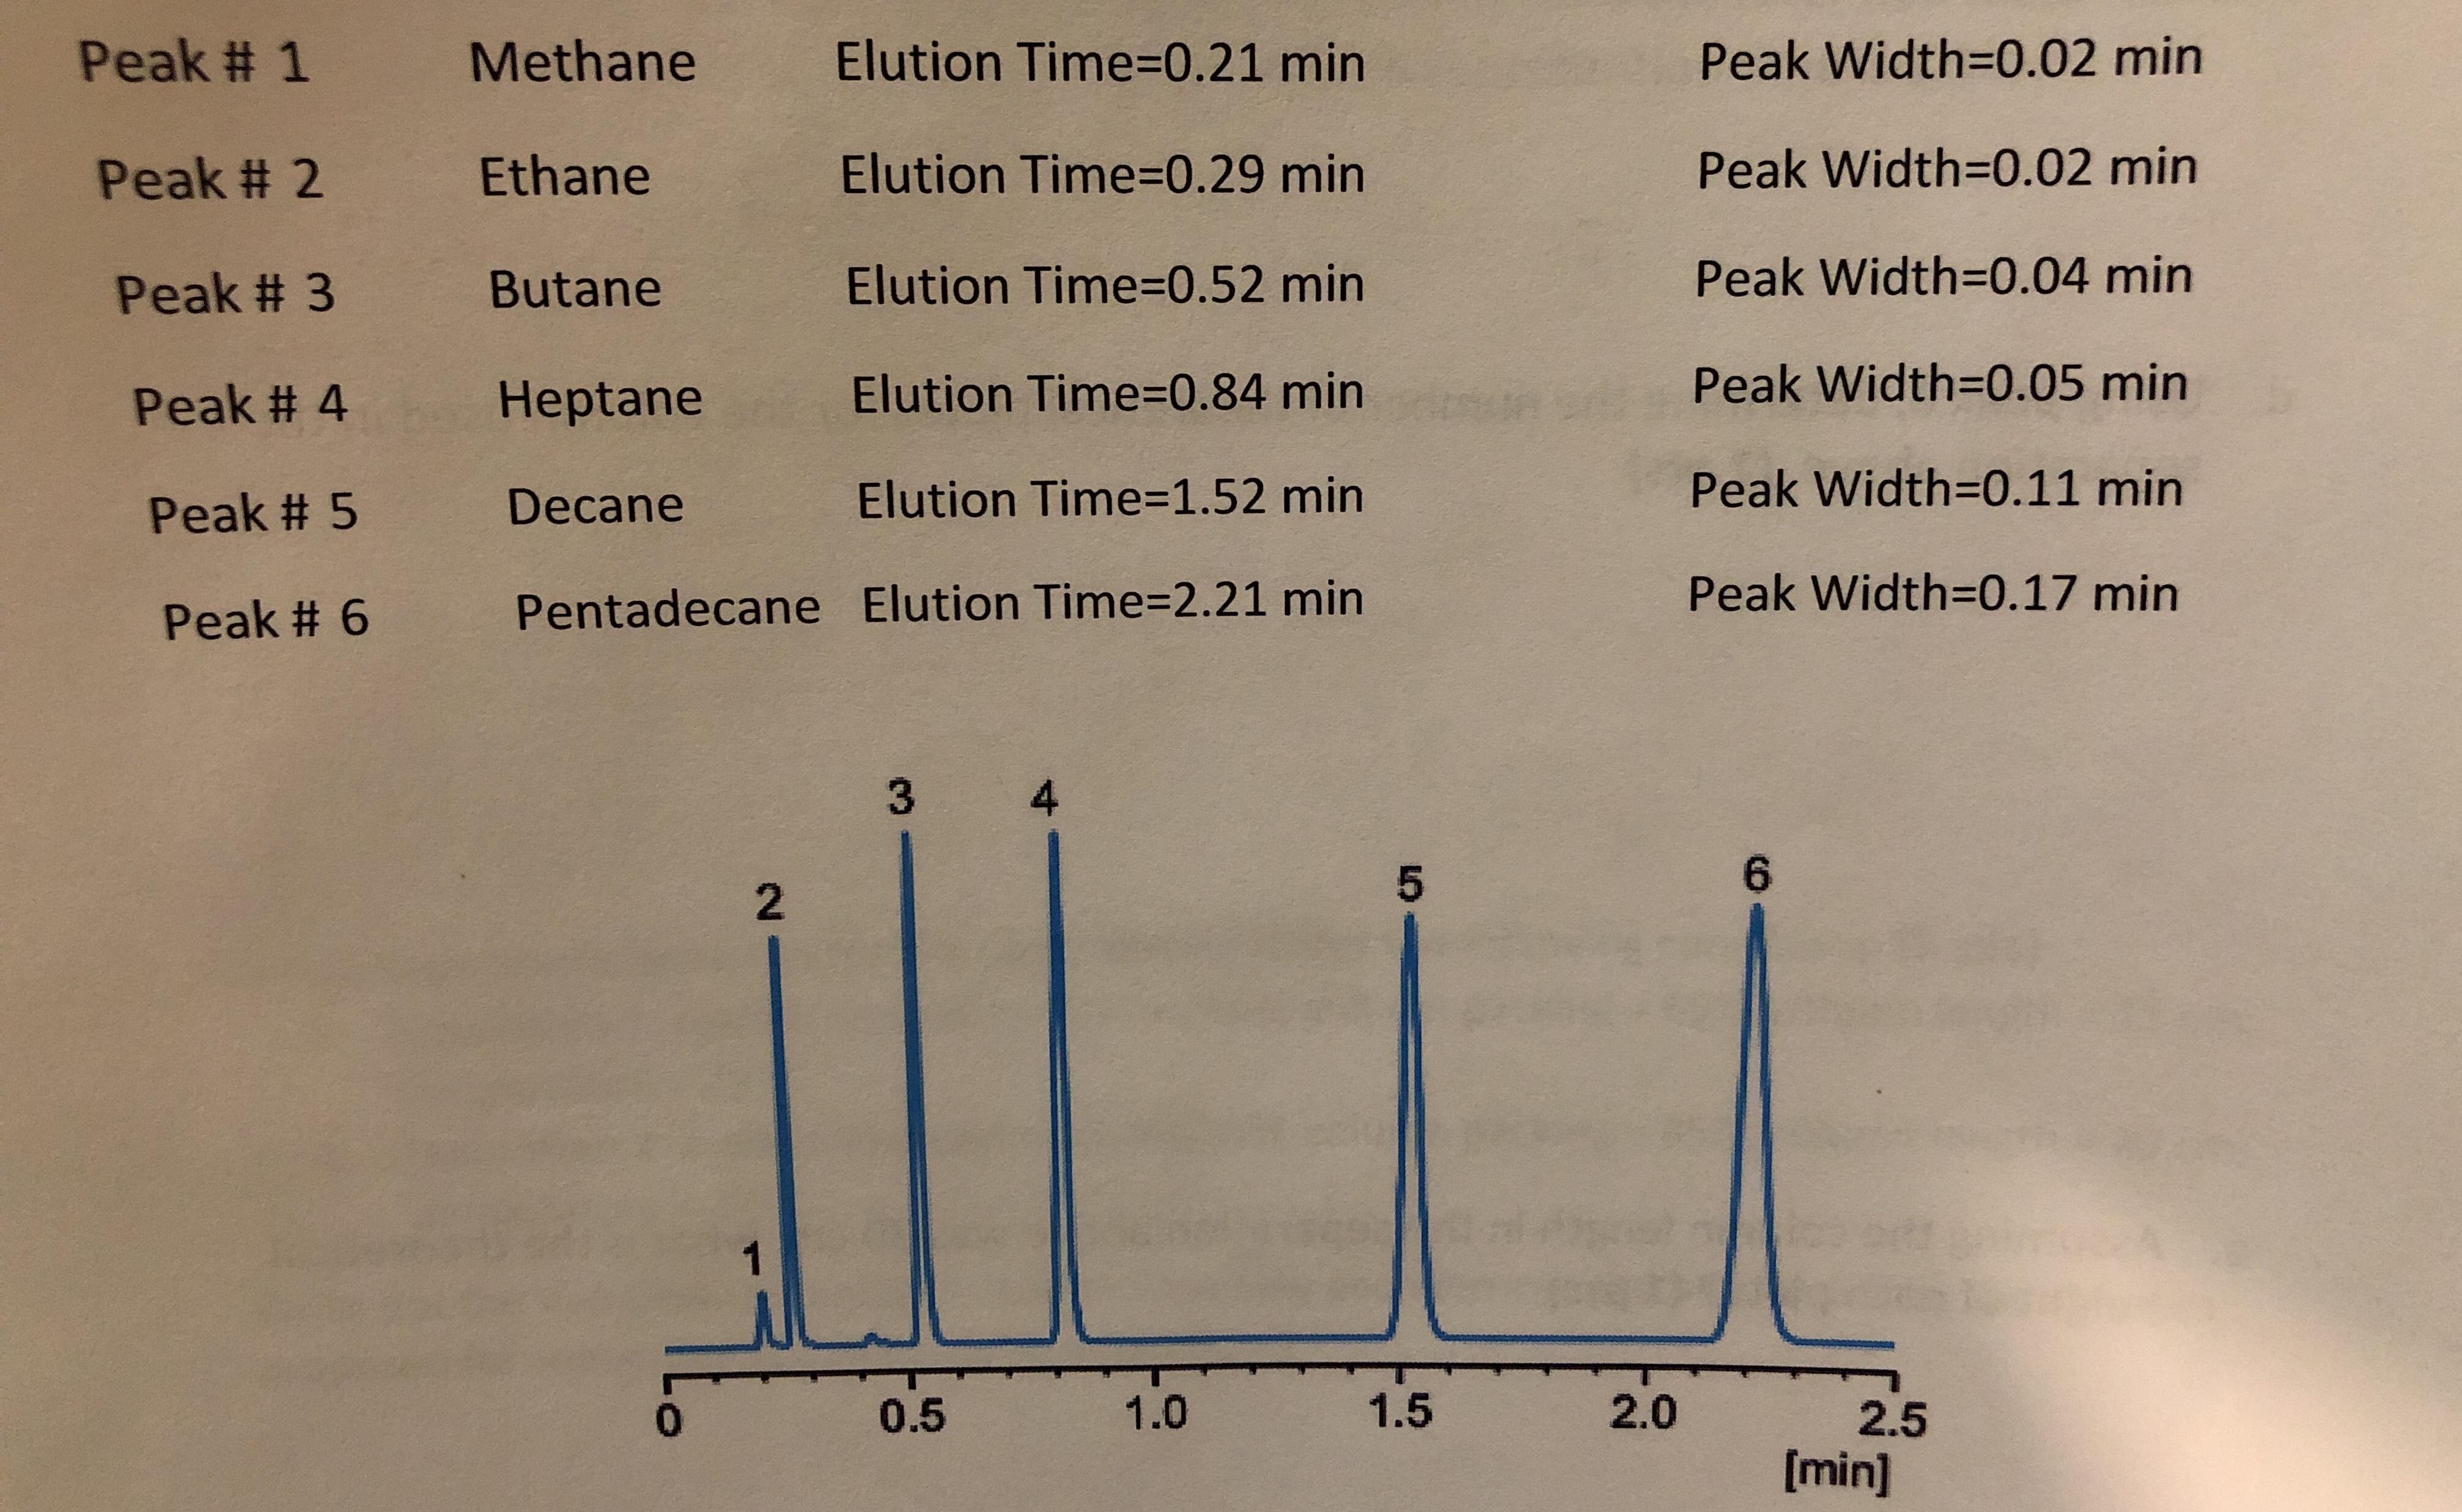 Peak # 1 Elution Time=0.21 min Peak Width=D0.02 min Methane Peak Width-D0.02 min Elution Time3D0.29 min Ethane Peak # 2 Peak Width=0.04 min Elution Time=0.52 min Butane Peak # 3 Peak Width=0.05 min Elution Time3D0.84 min Heptane Peak # 4 Peak Width=0.11 min Elution Time=1.52 min Decane Peak # 5 Peak Width=0.17 min Pentadecane Elution Time32.21 min Peak # 6 4 6. 1.5 2.0 1.0 0.5 2.5 [min] 2.